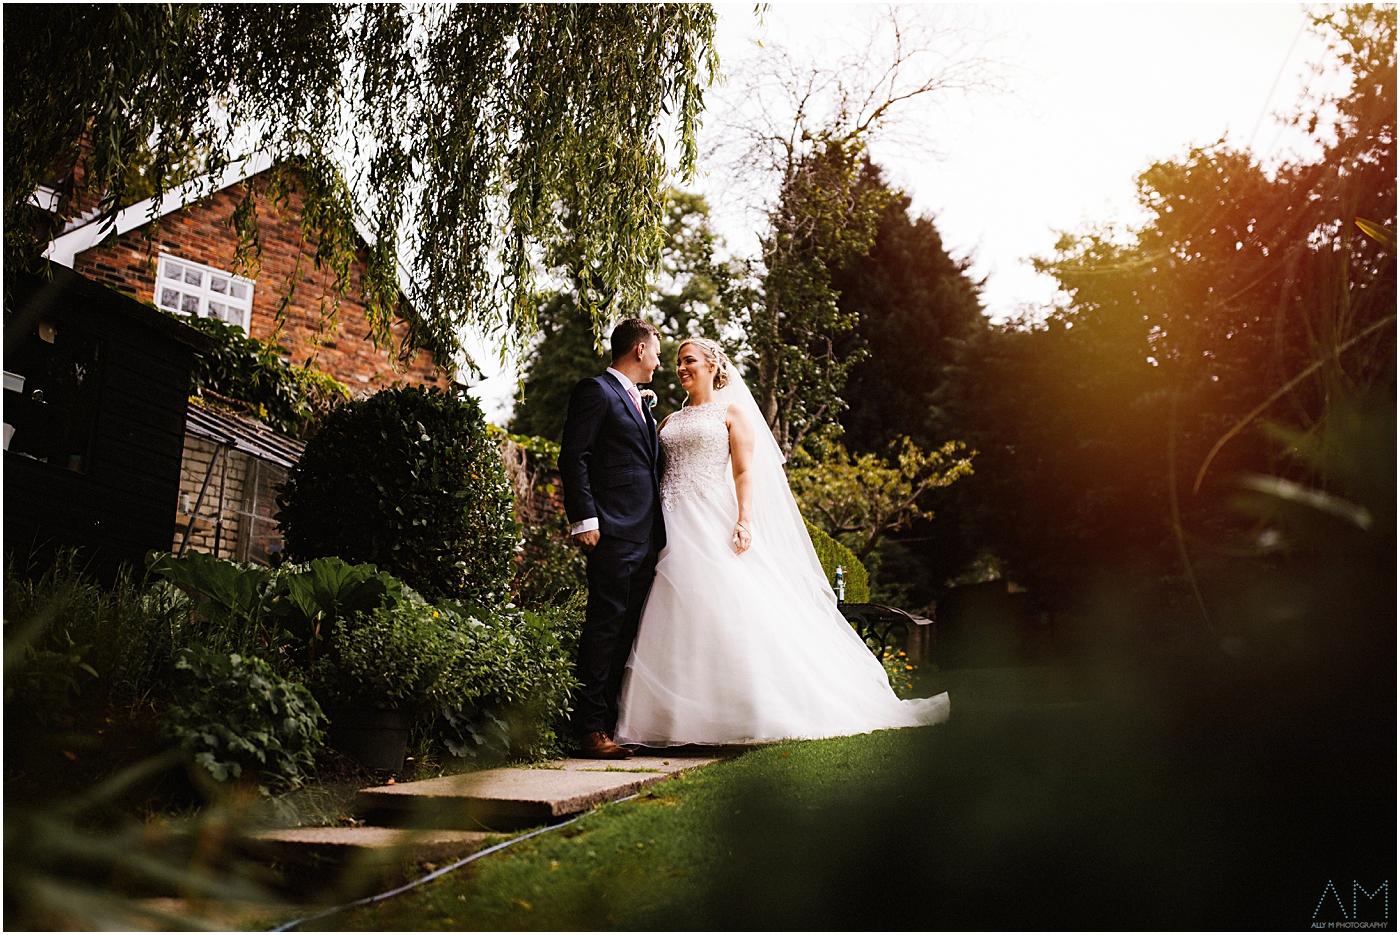 Bride and groom at Alderley Edge Hotel